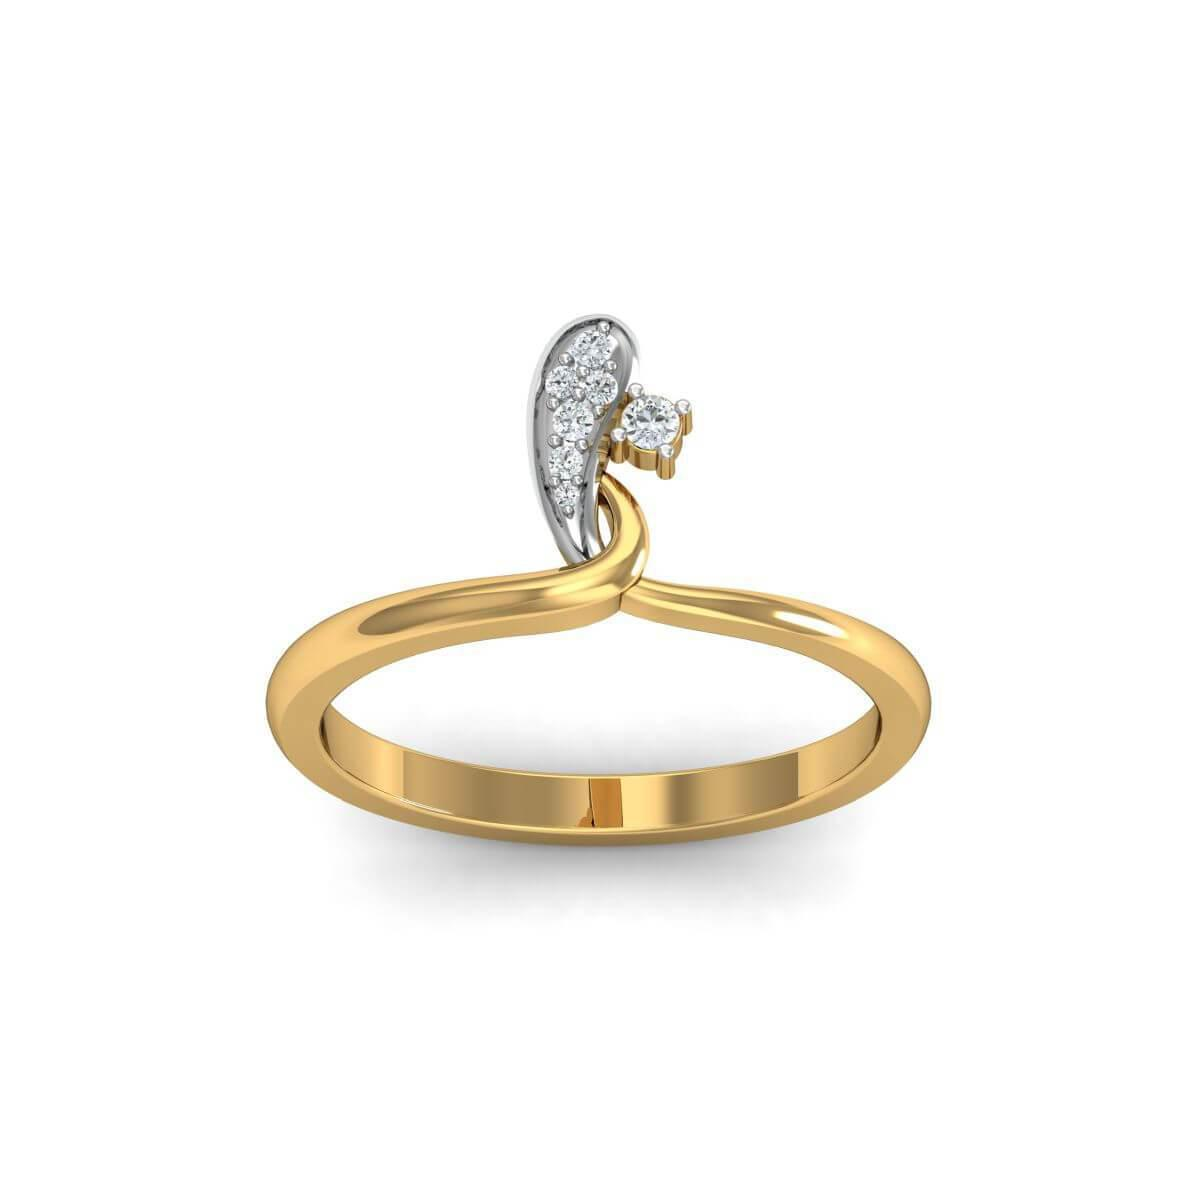 Diamoire Jewels 18kt Yellow Gold Pave 0.07ct Diamond Infinity Ring III - UK G 1/4 - US 3 1/2 - EU 45 3/4 Emvem5